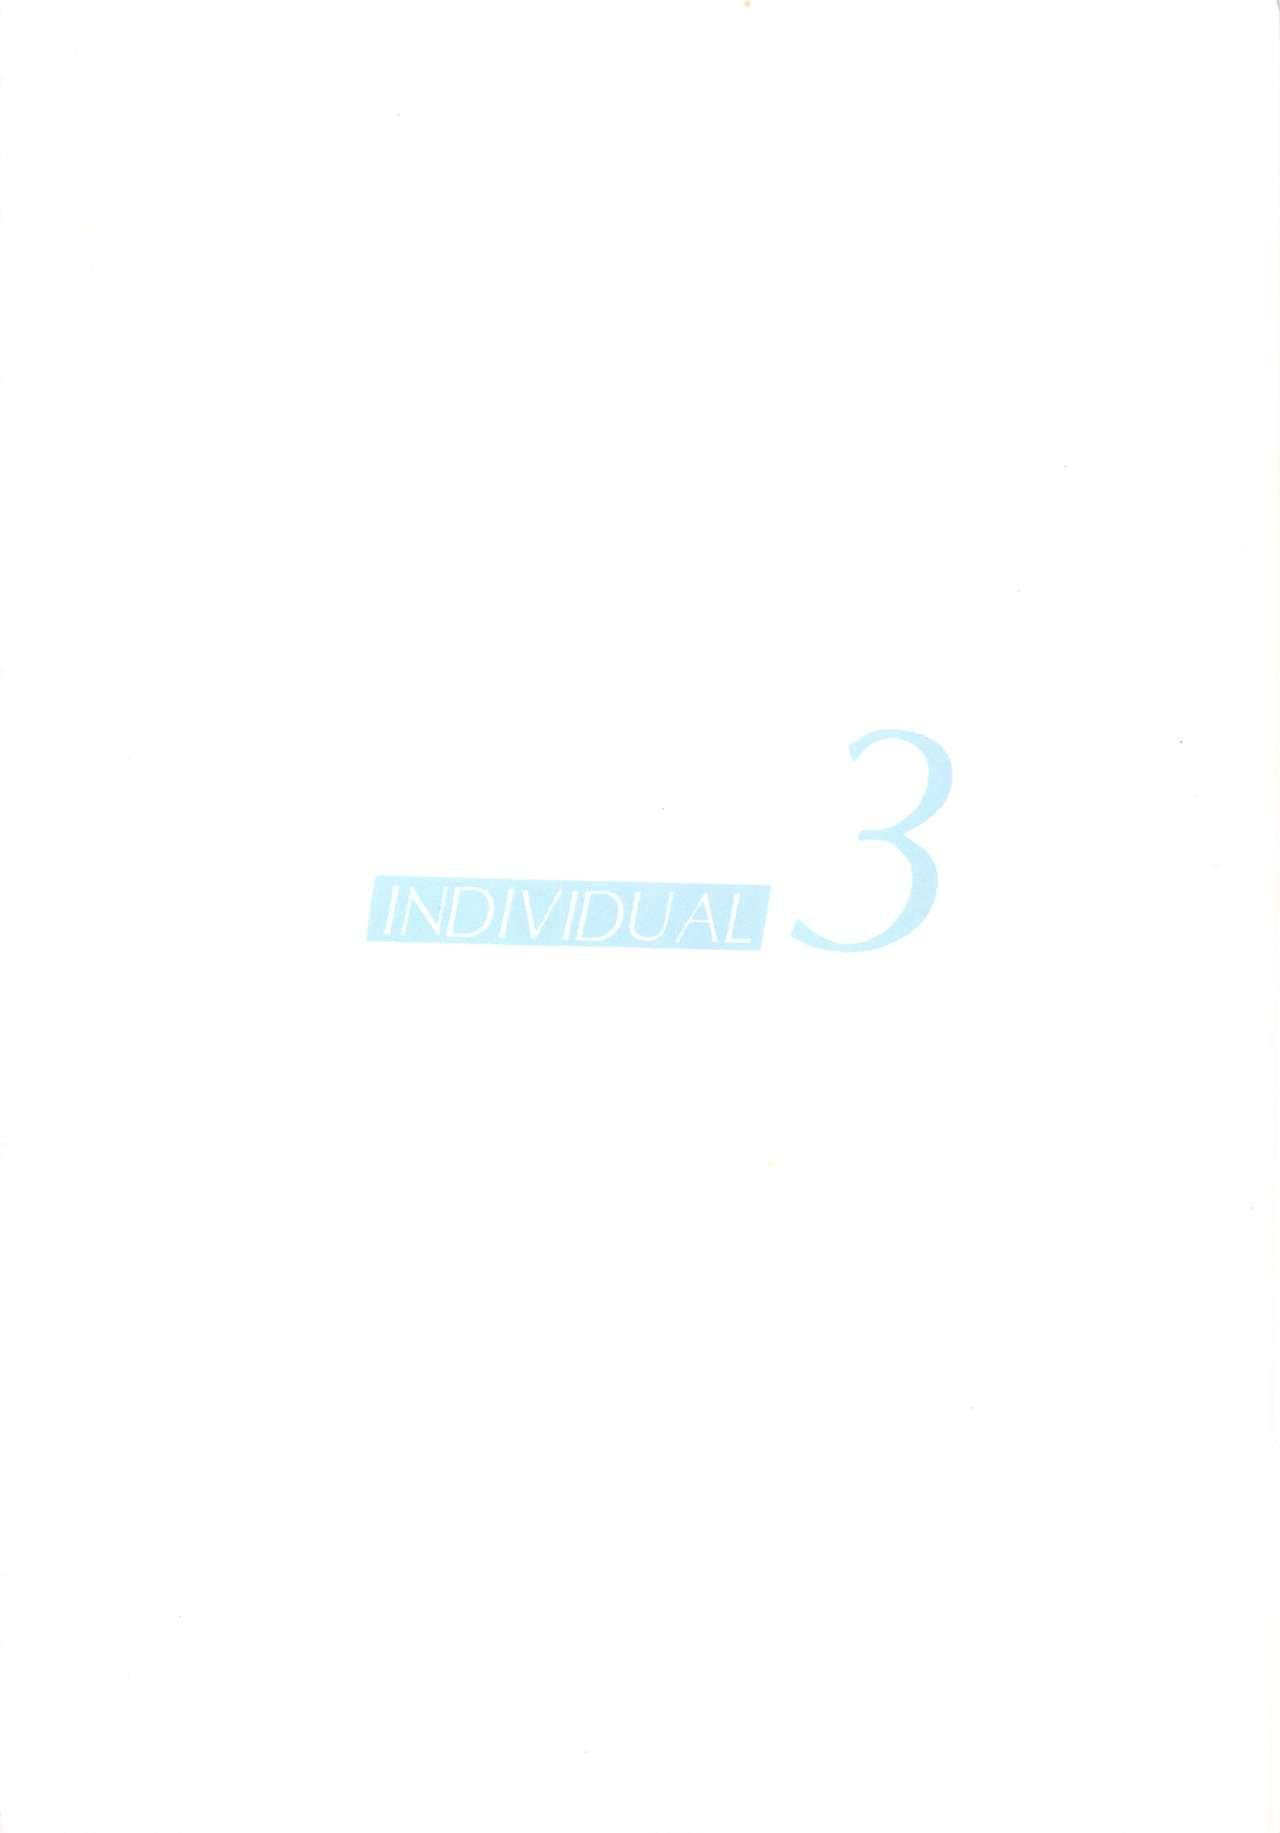 INDIVIDUAL 3 - 19930816 → 83